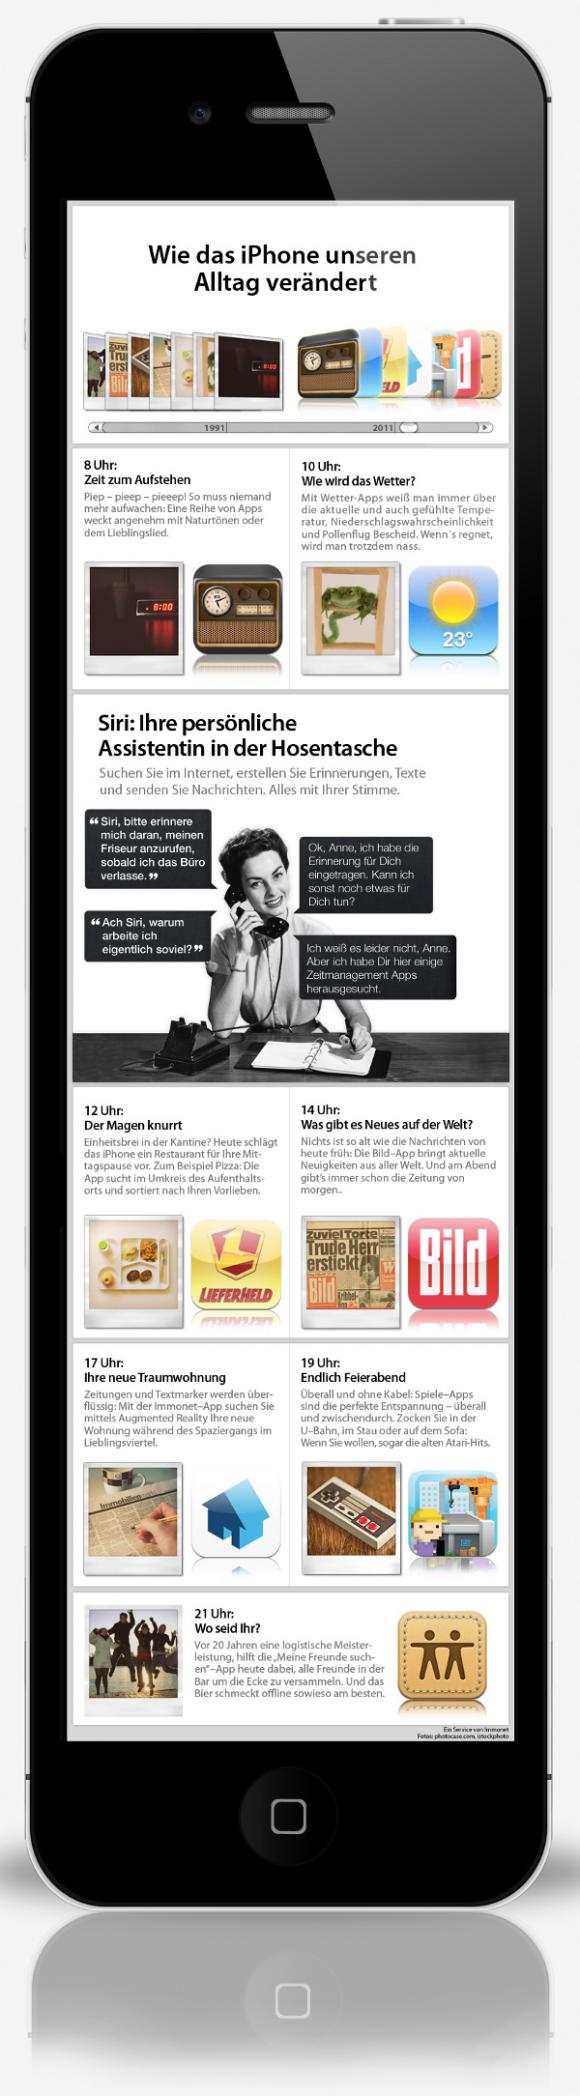 https://www.immonet.de/service/fileadmin/img/infografik/infografik-iphone-final.jpg